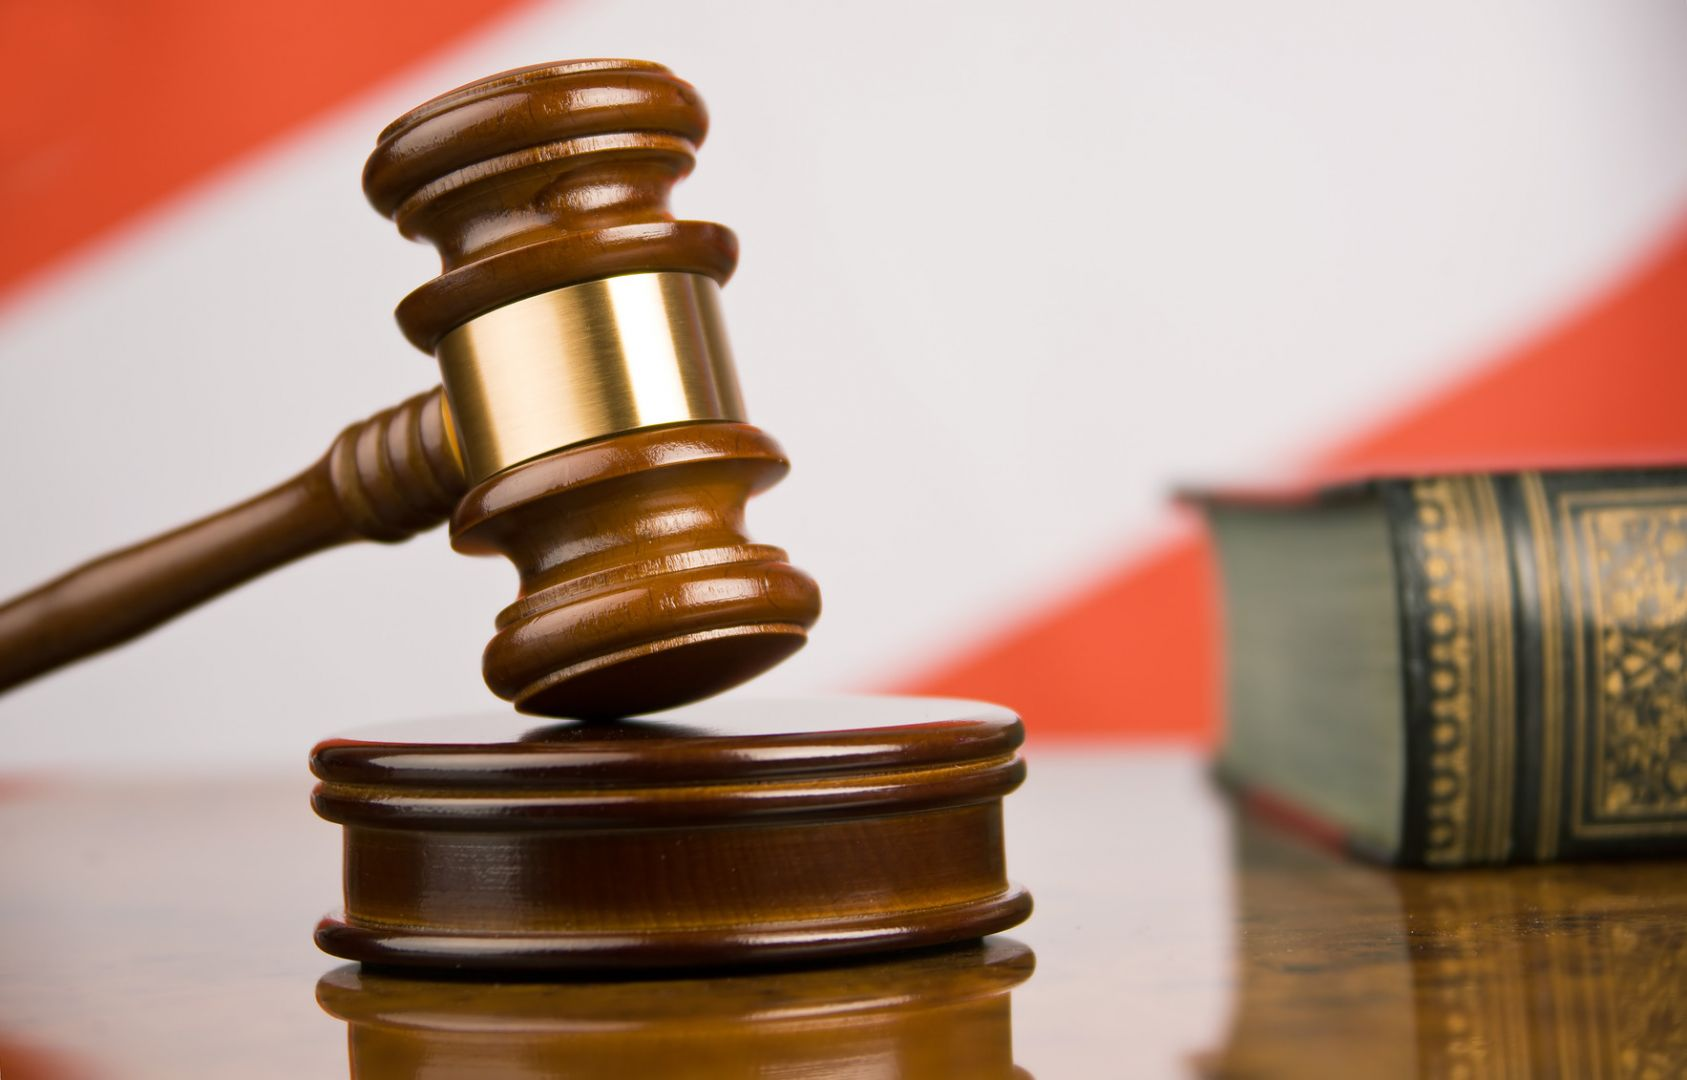 Ставрополец за 4 миллиона рублей обещал устроить знакомого на работу судьёй